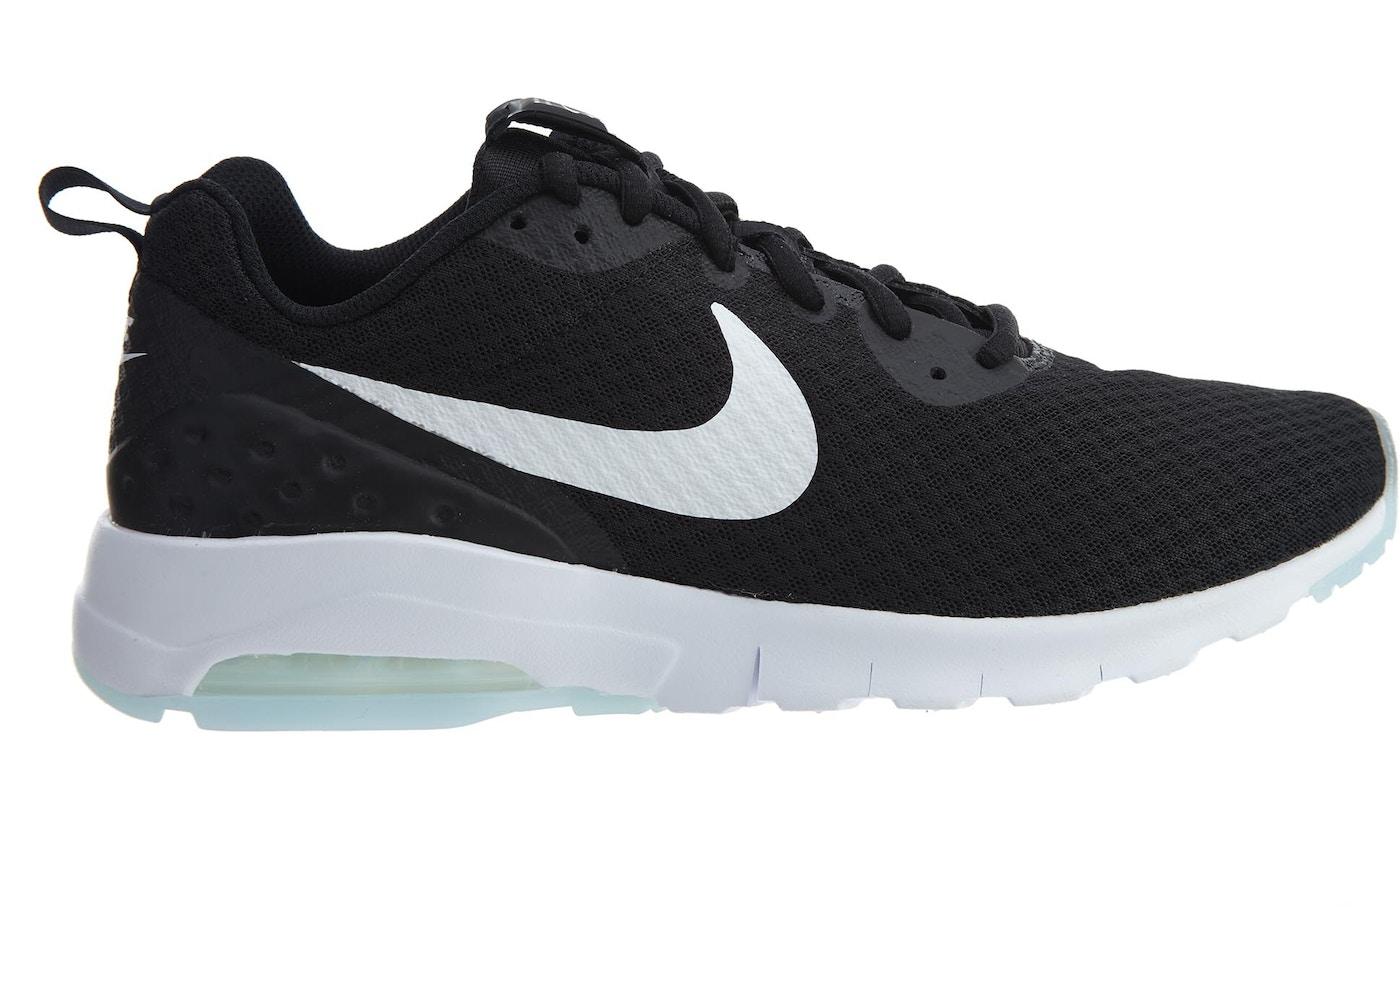 premium selection 3161e 33832 Nike Air Max Motion Lw Black White